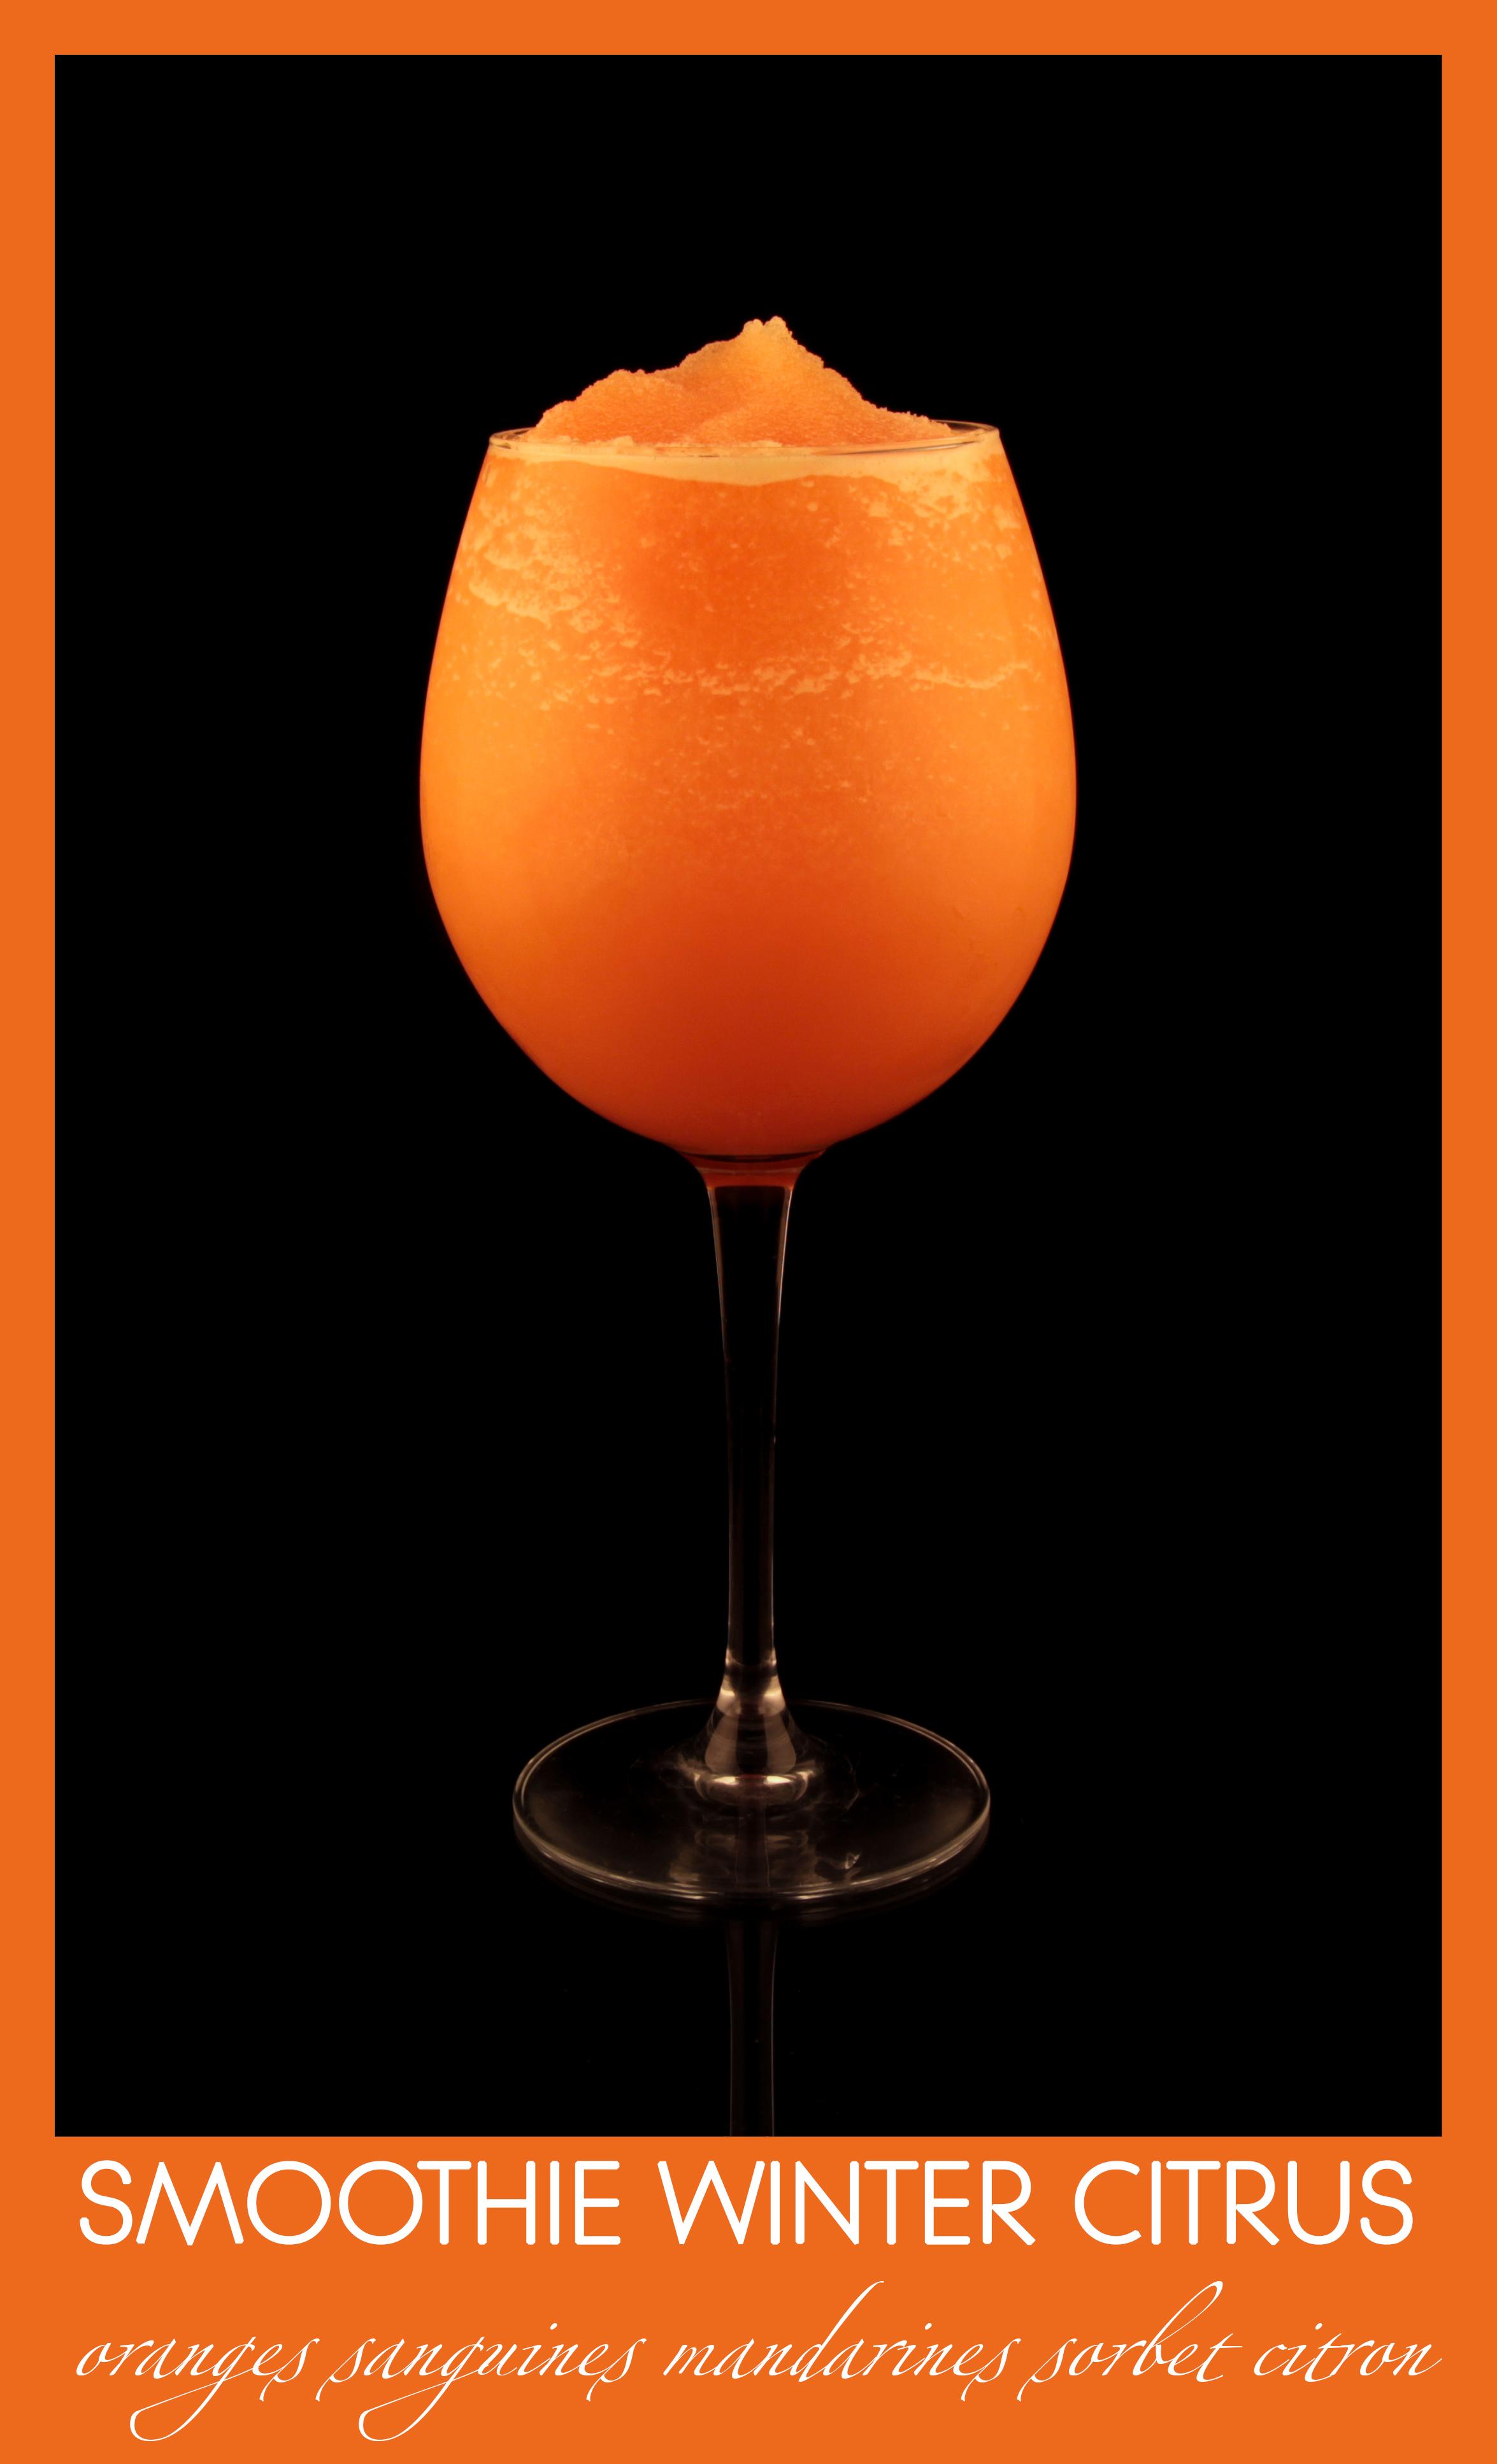 Smoothie Winter Citrus.jpg